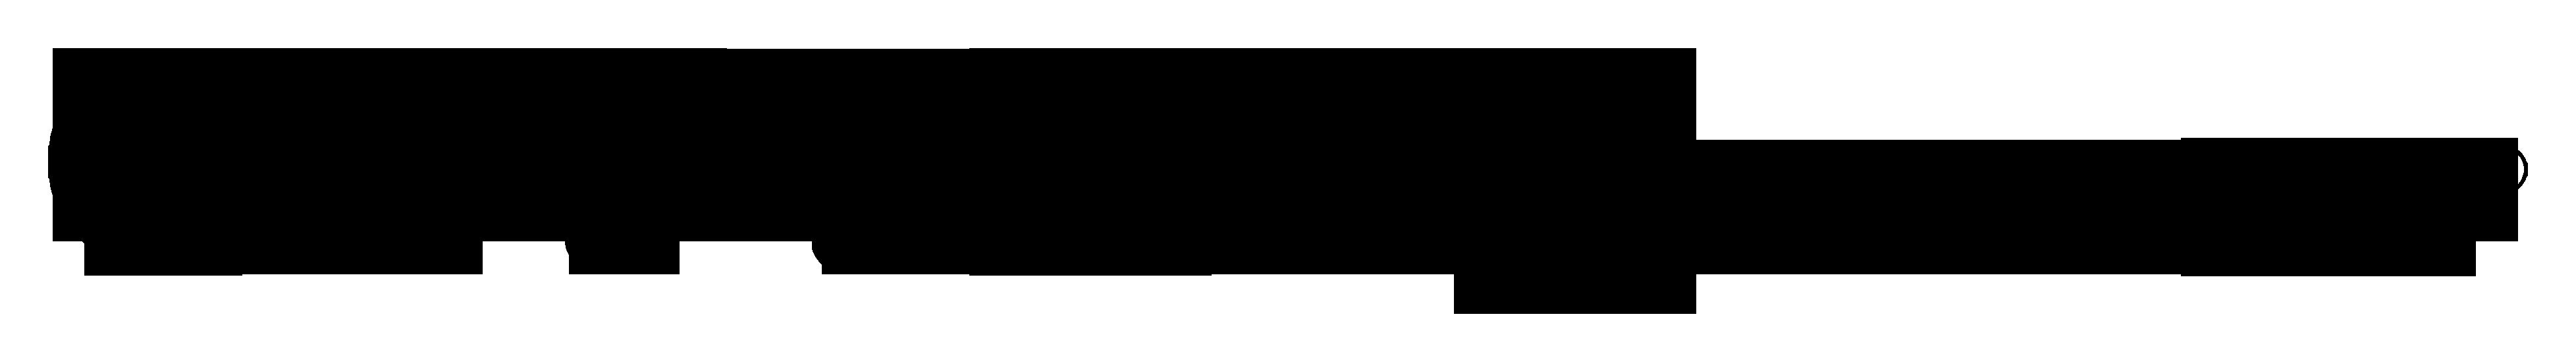 Crye-Leike, Inc., Realtors